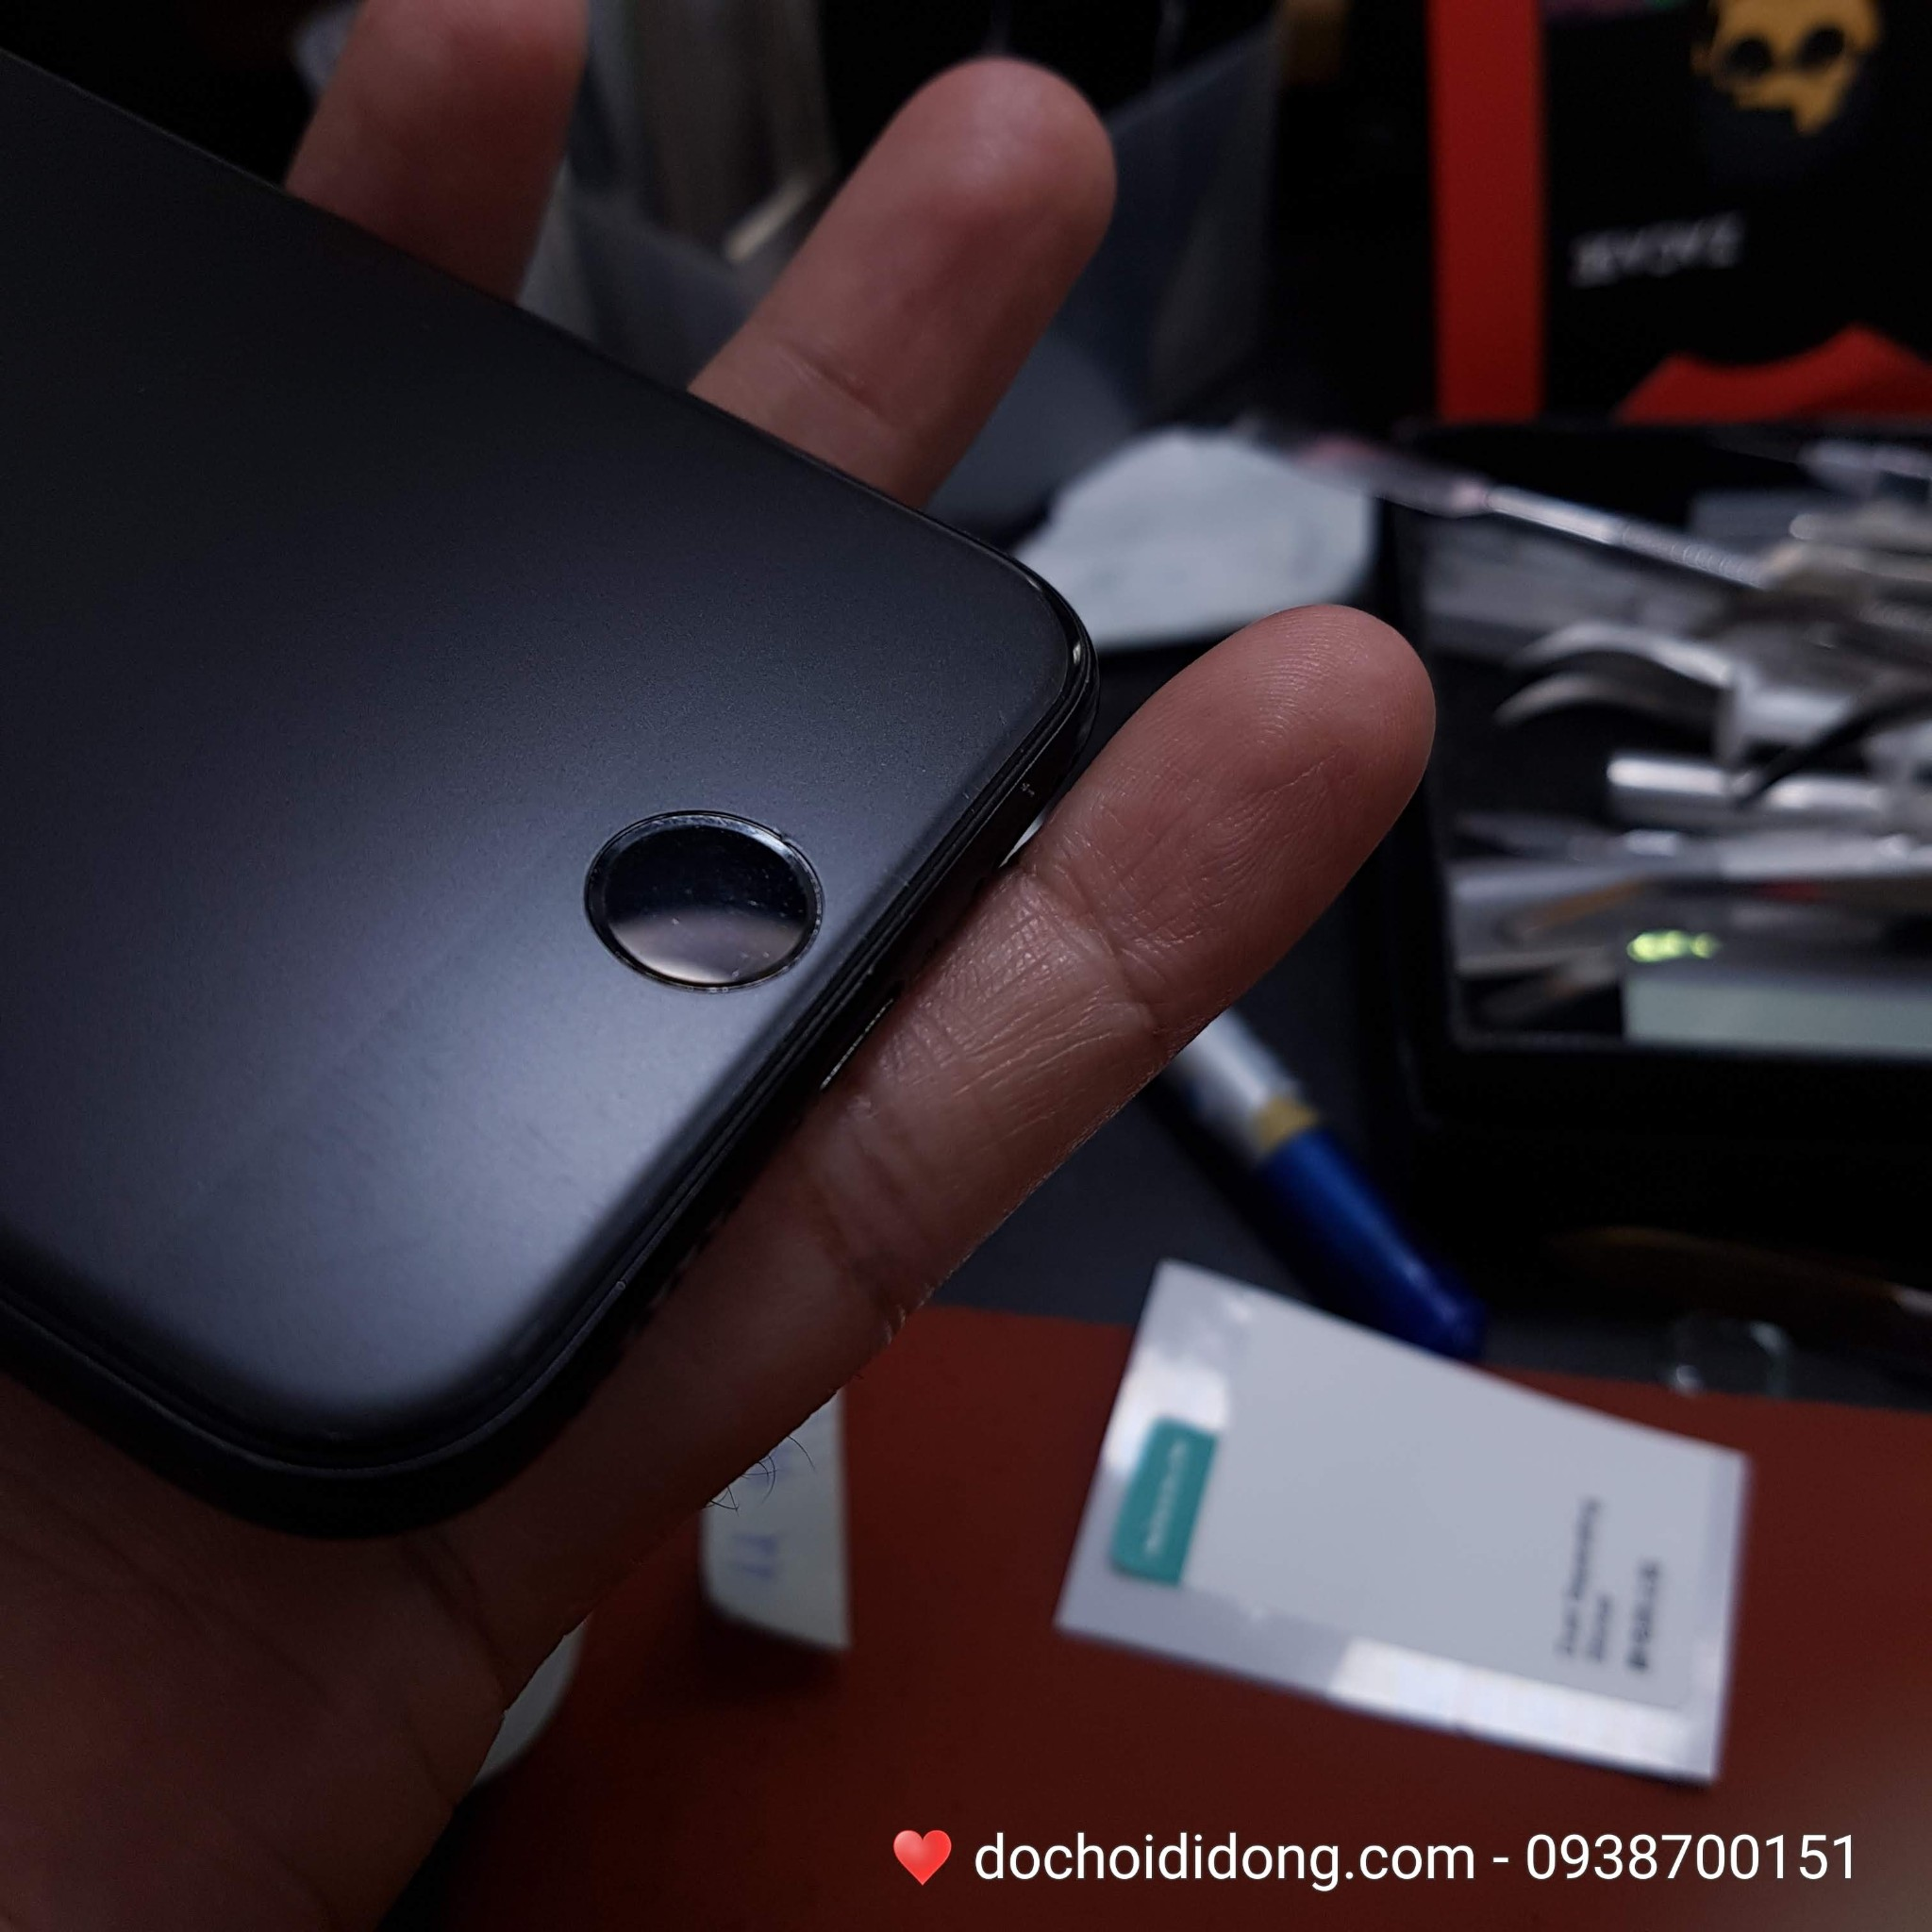 mieng-dan-ppf-iphone-7-trong-nham-doi-mau-cao-cap